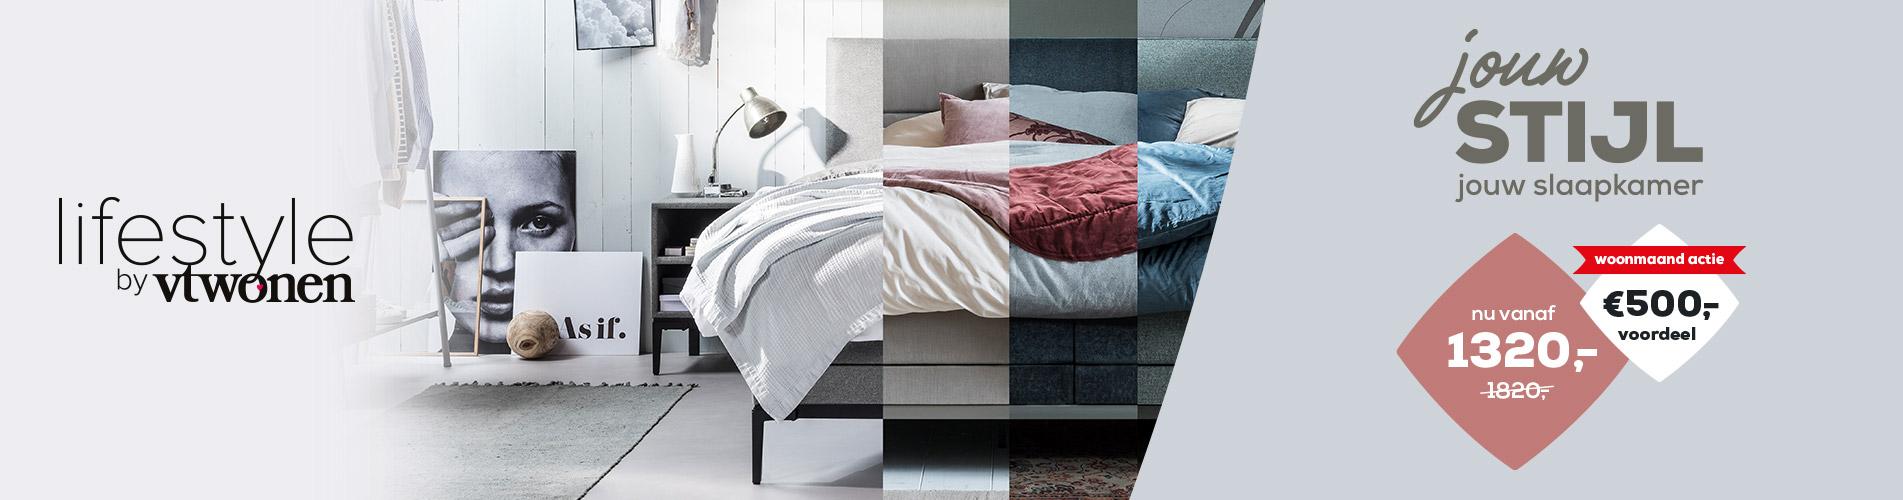 Woonmaand / Jouw stijl jouw slaapkamer | Swiss Sense